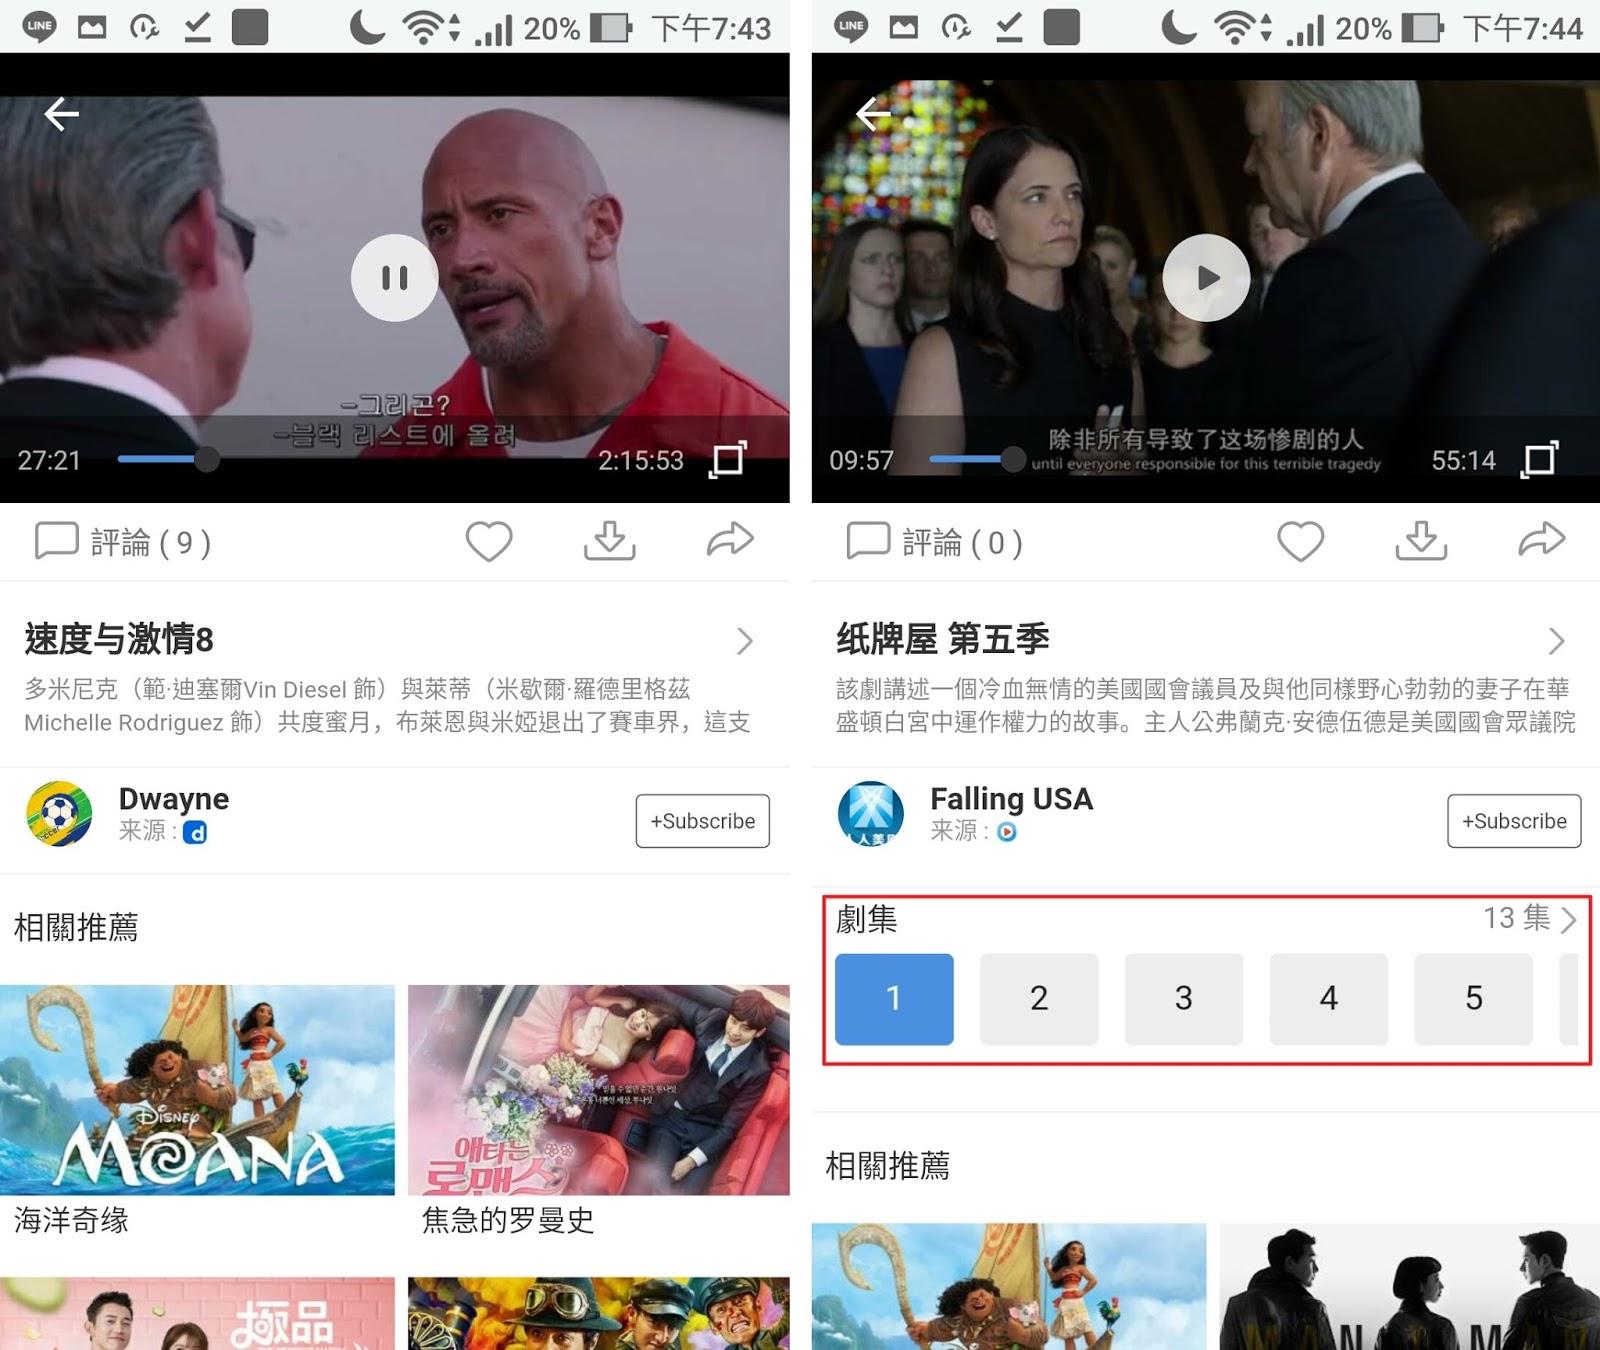 Screenshot 20170602 194335 - 酷播復活!《123Kubo》手機App,速度超快、片源豐富,還能下載離線撥放!